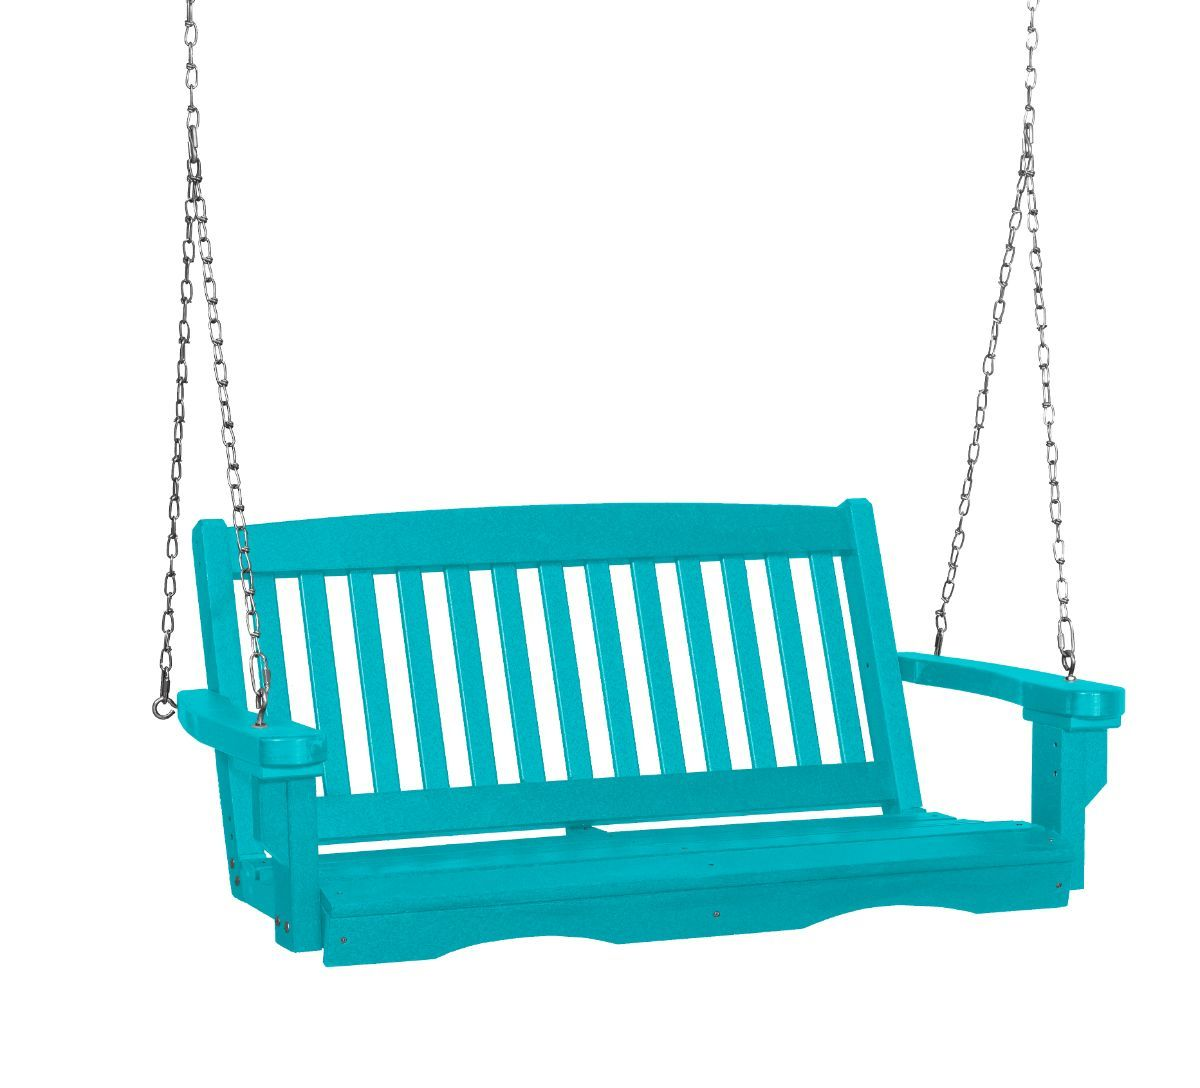 Aruba Blue Aniva Adirondack Swing